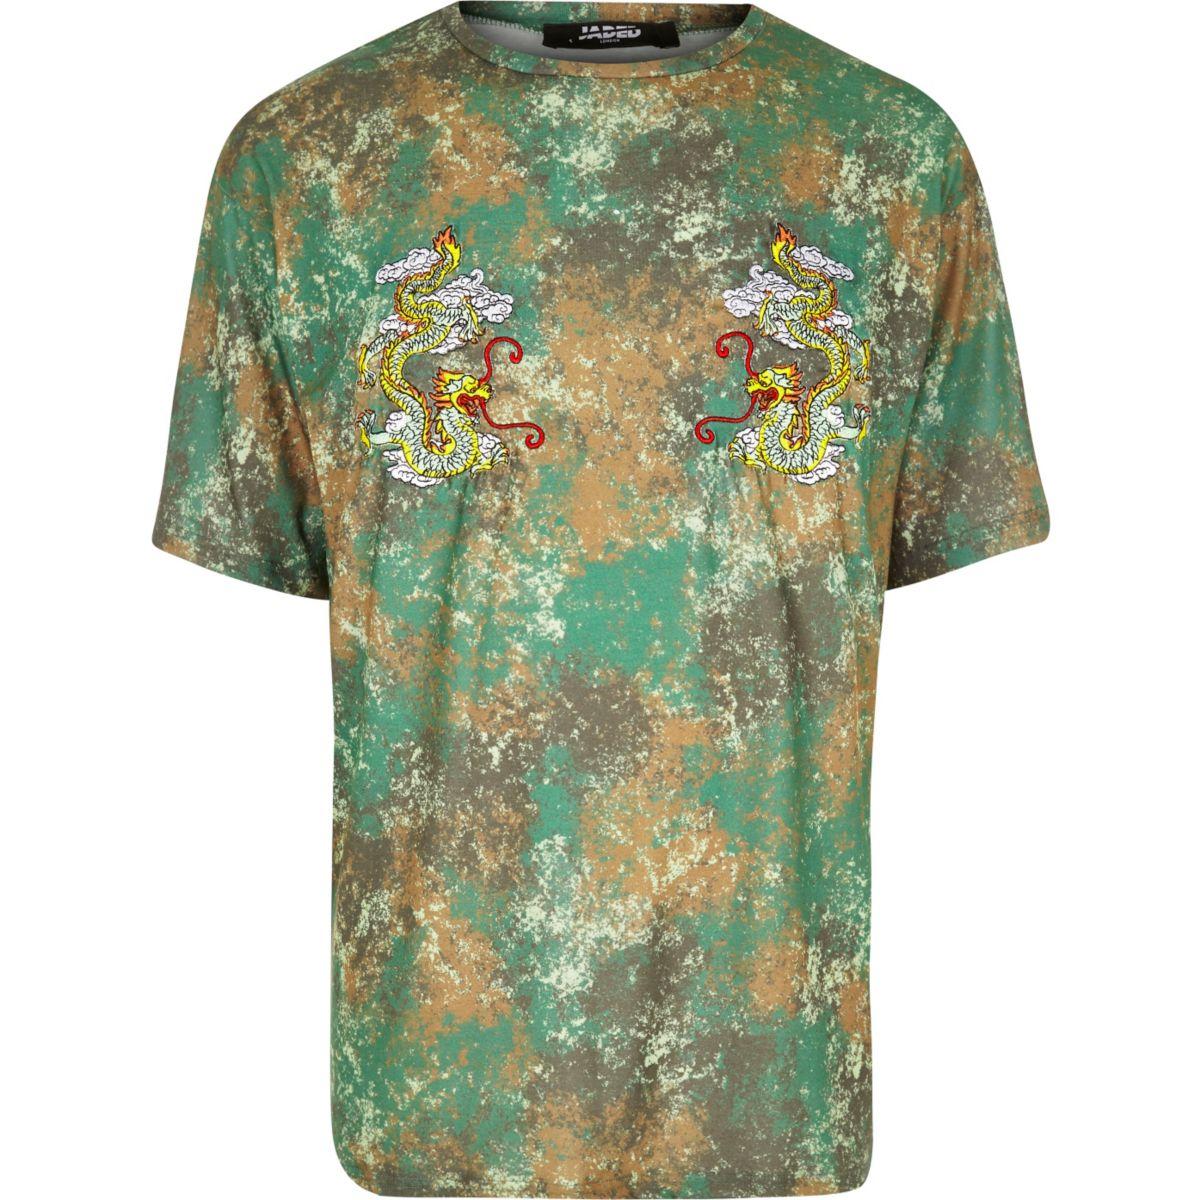 Green Jaded London camo dragon T-shirt